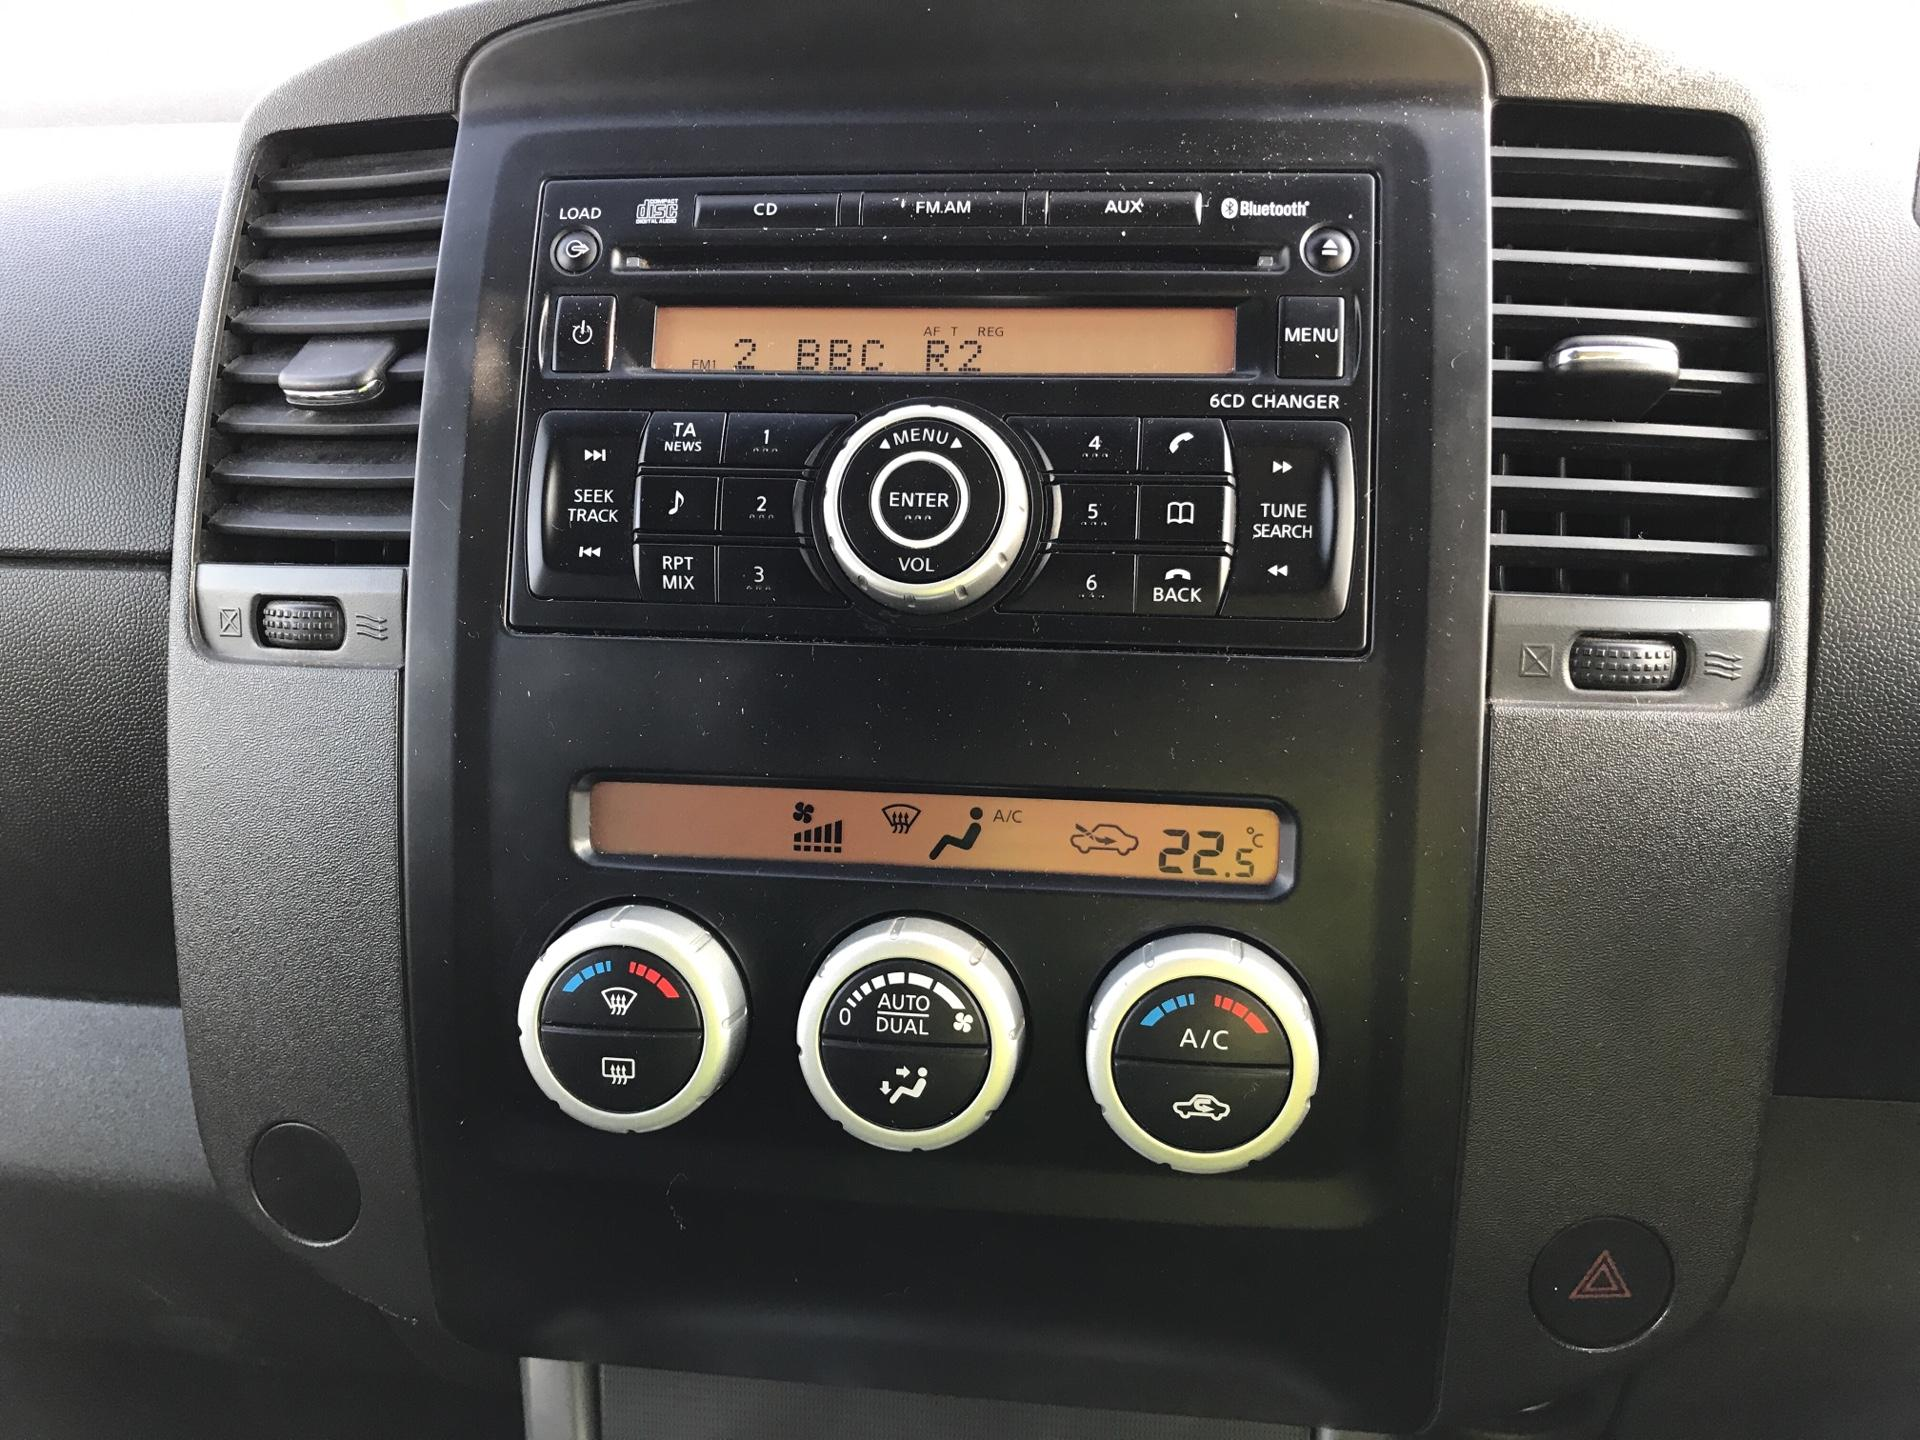 2011 Nissan Navara TEKNA 2.5 DCI 188 DOUBLE CAB AUTO EURO 4 (YX11WZV) Image 10